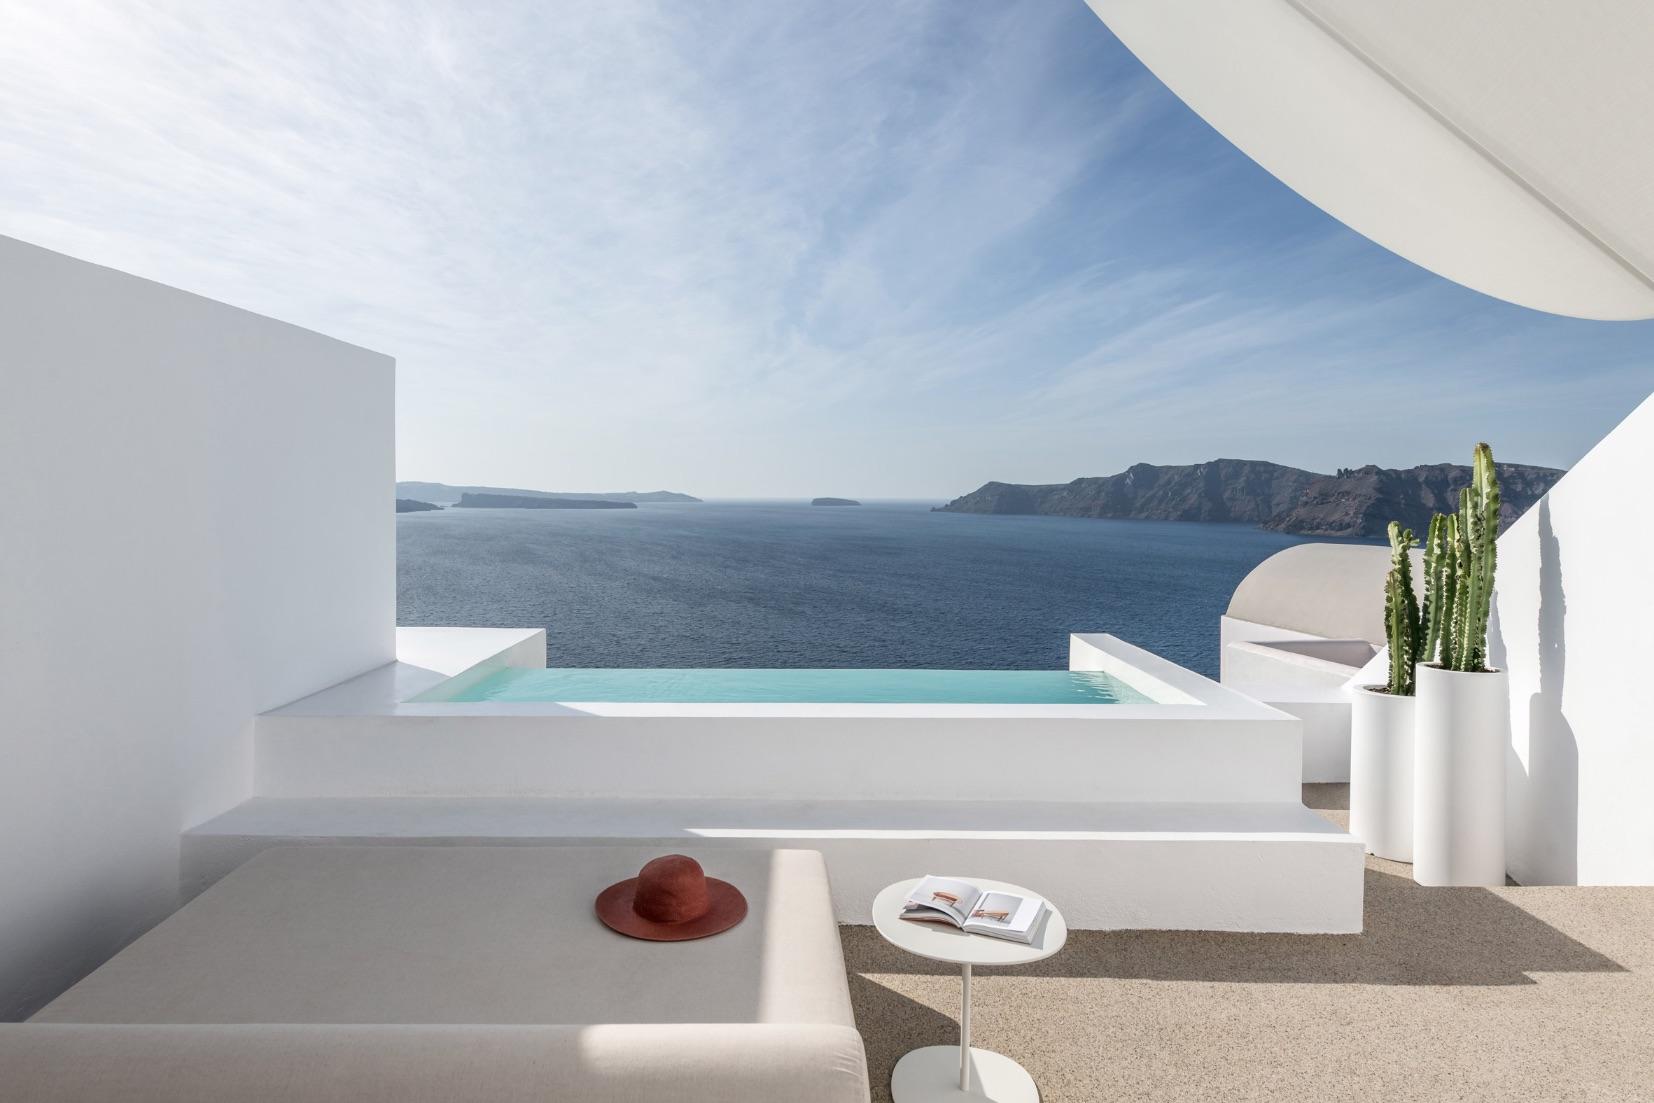 4_Saint Hotel_Kapsimalis Architects_Inspirationist